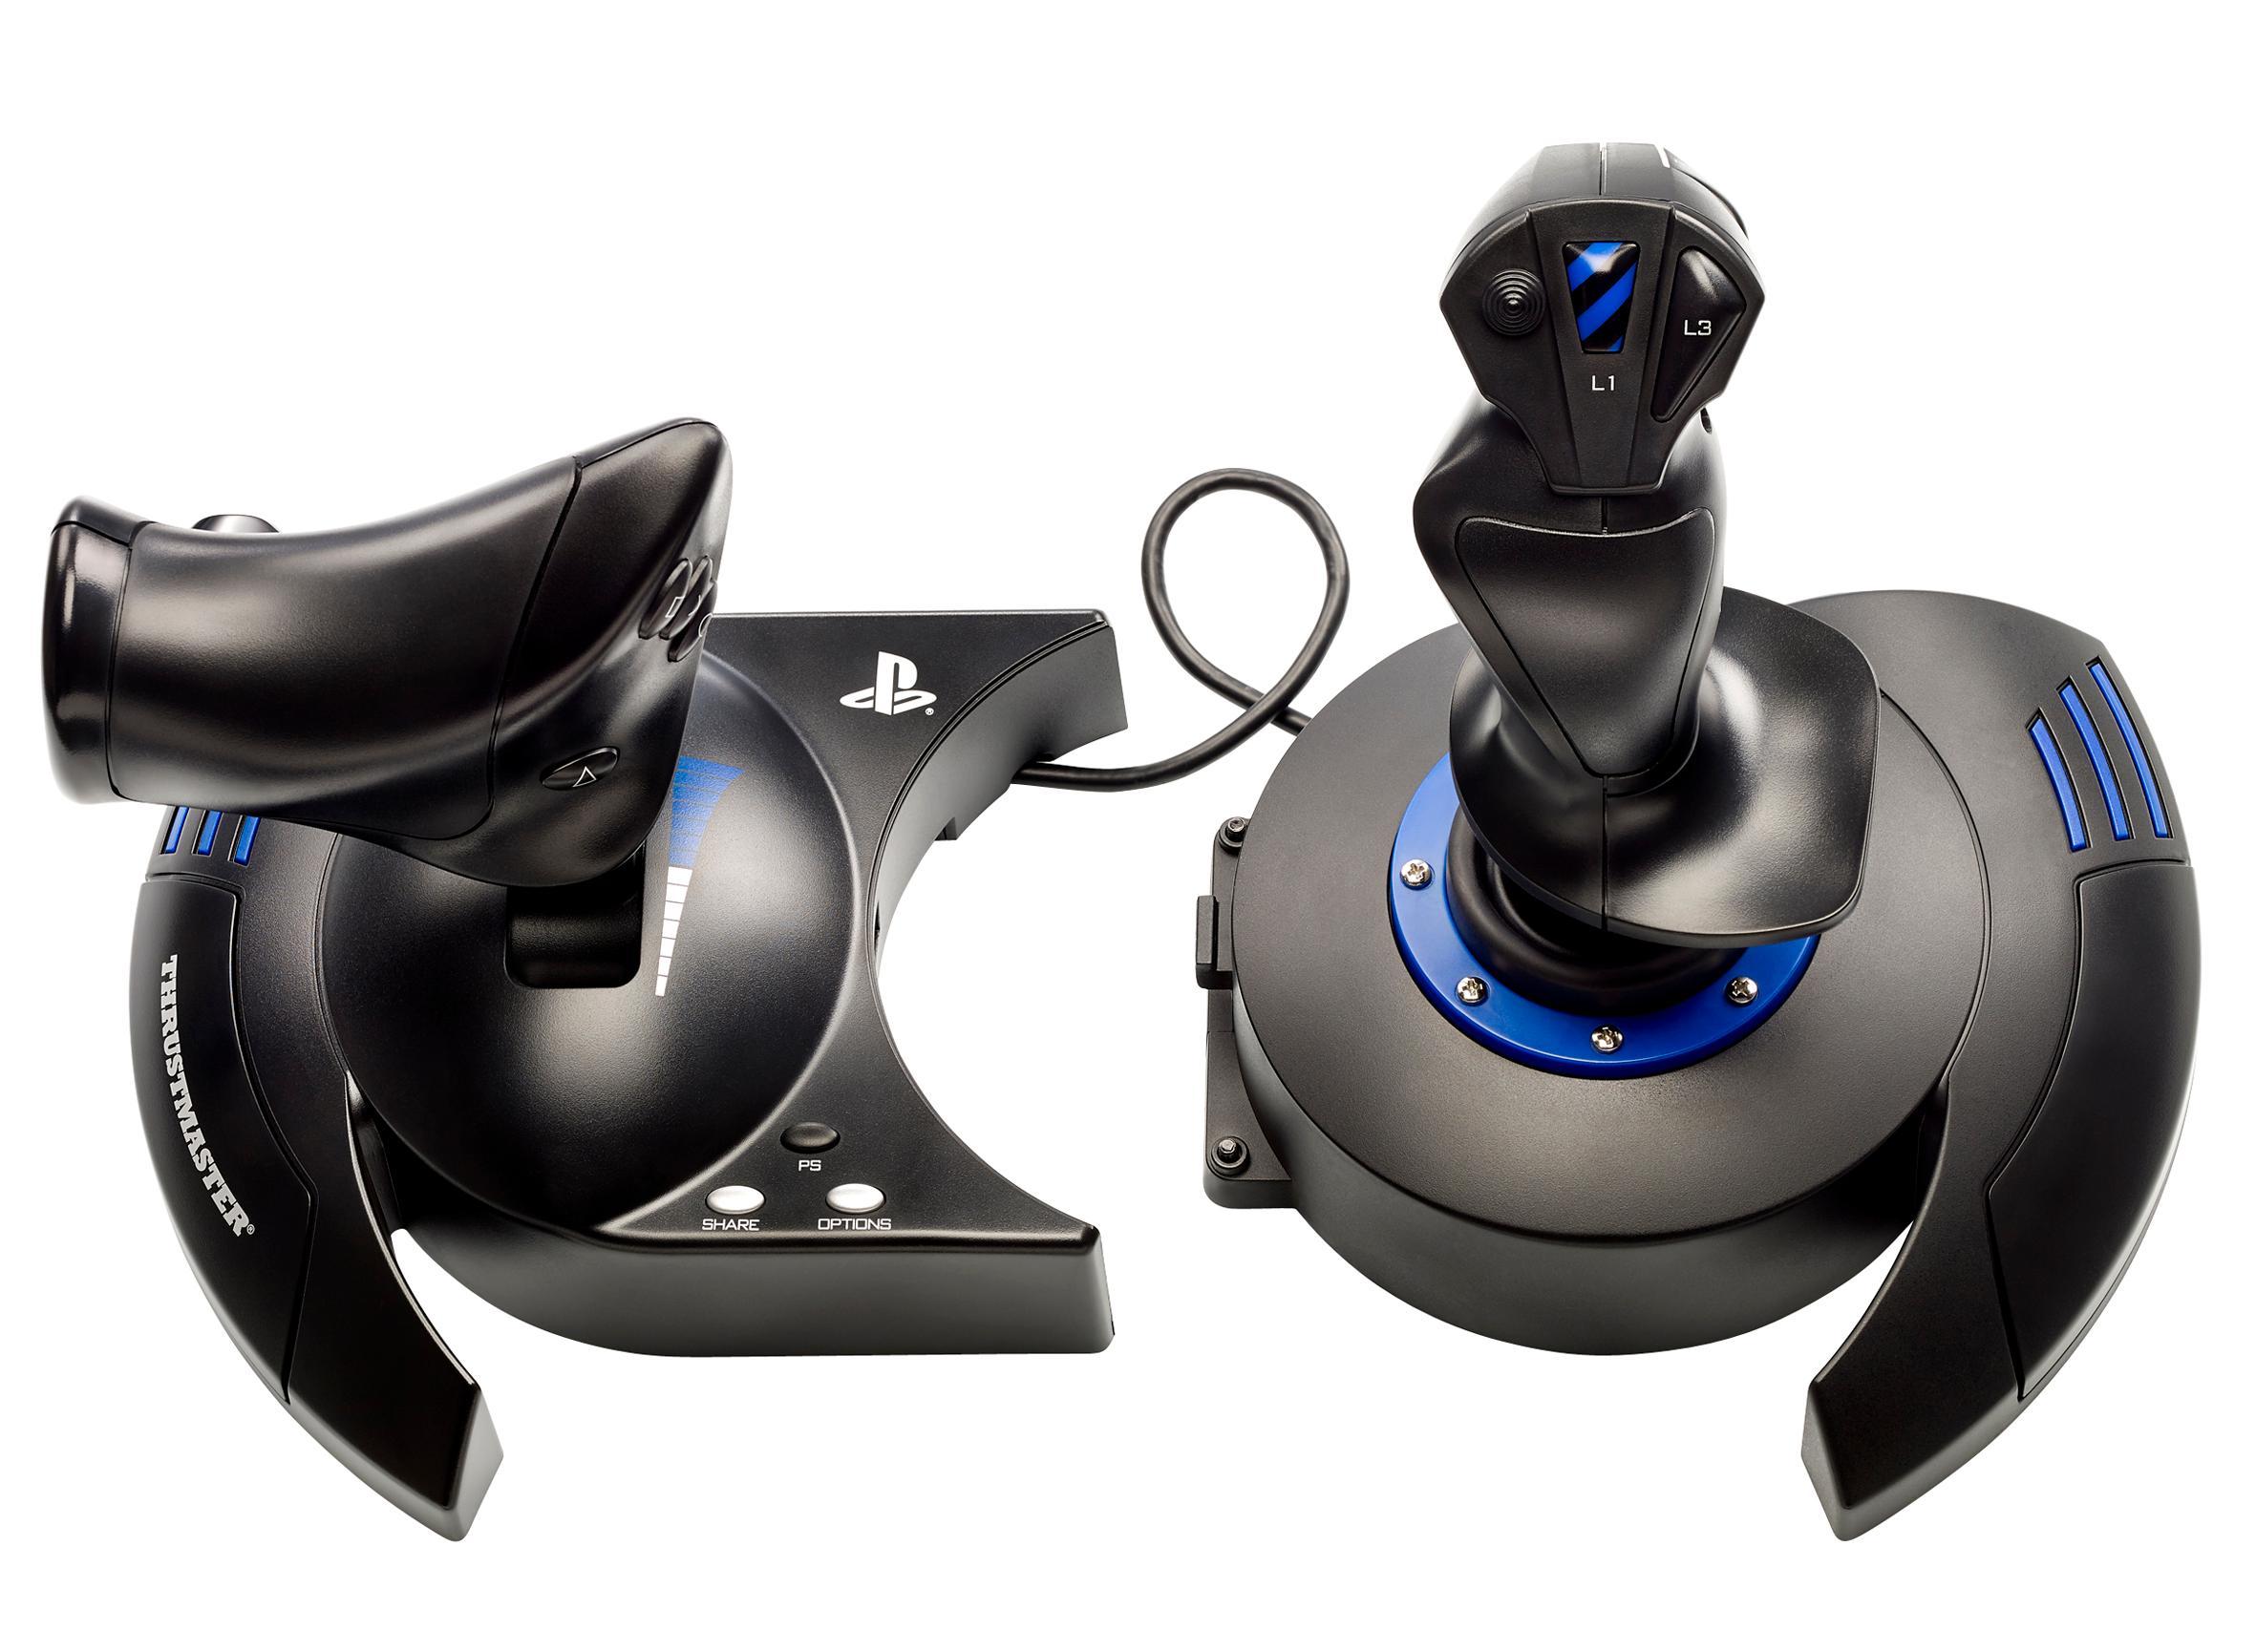 Amazon com: Thrustmaster T Flight Hotas 4 Flight Stick for PS4 & PC